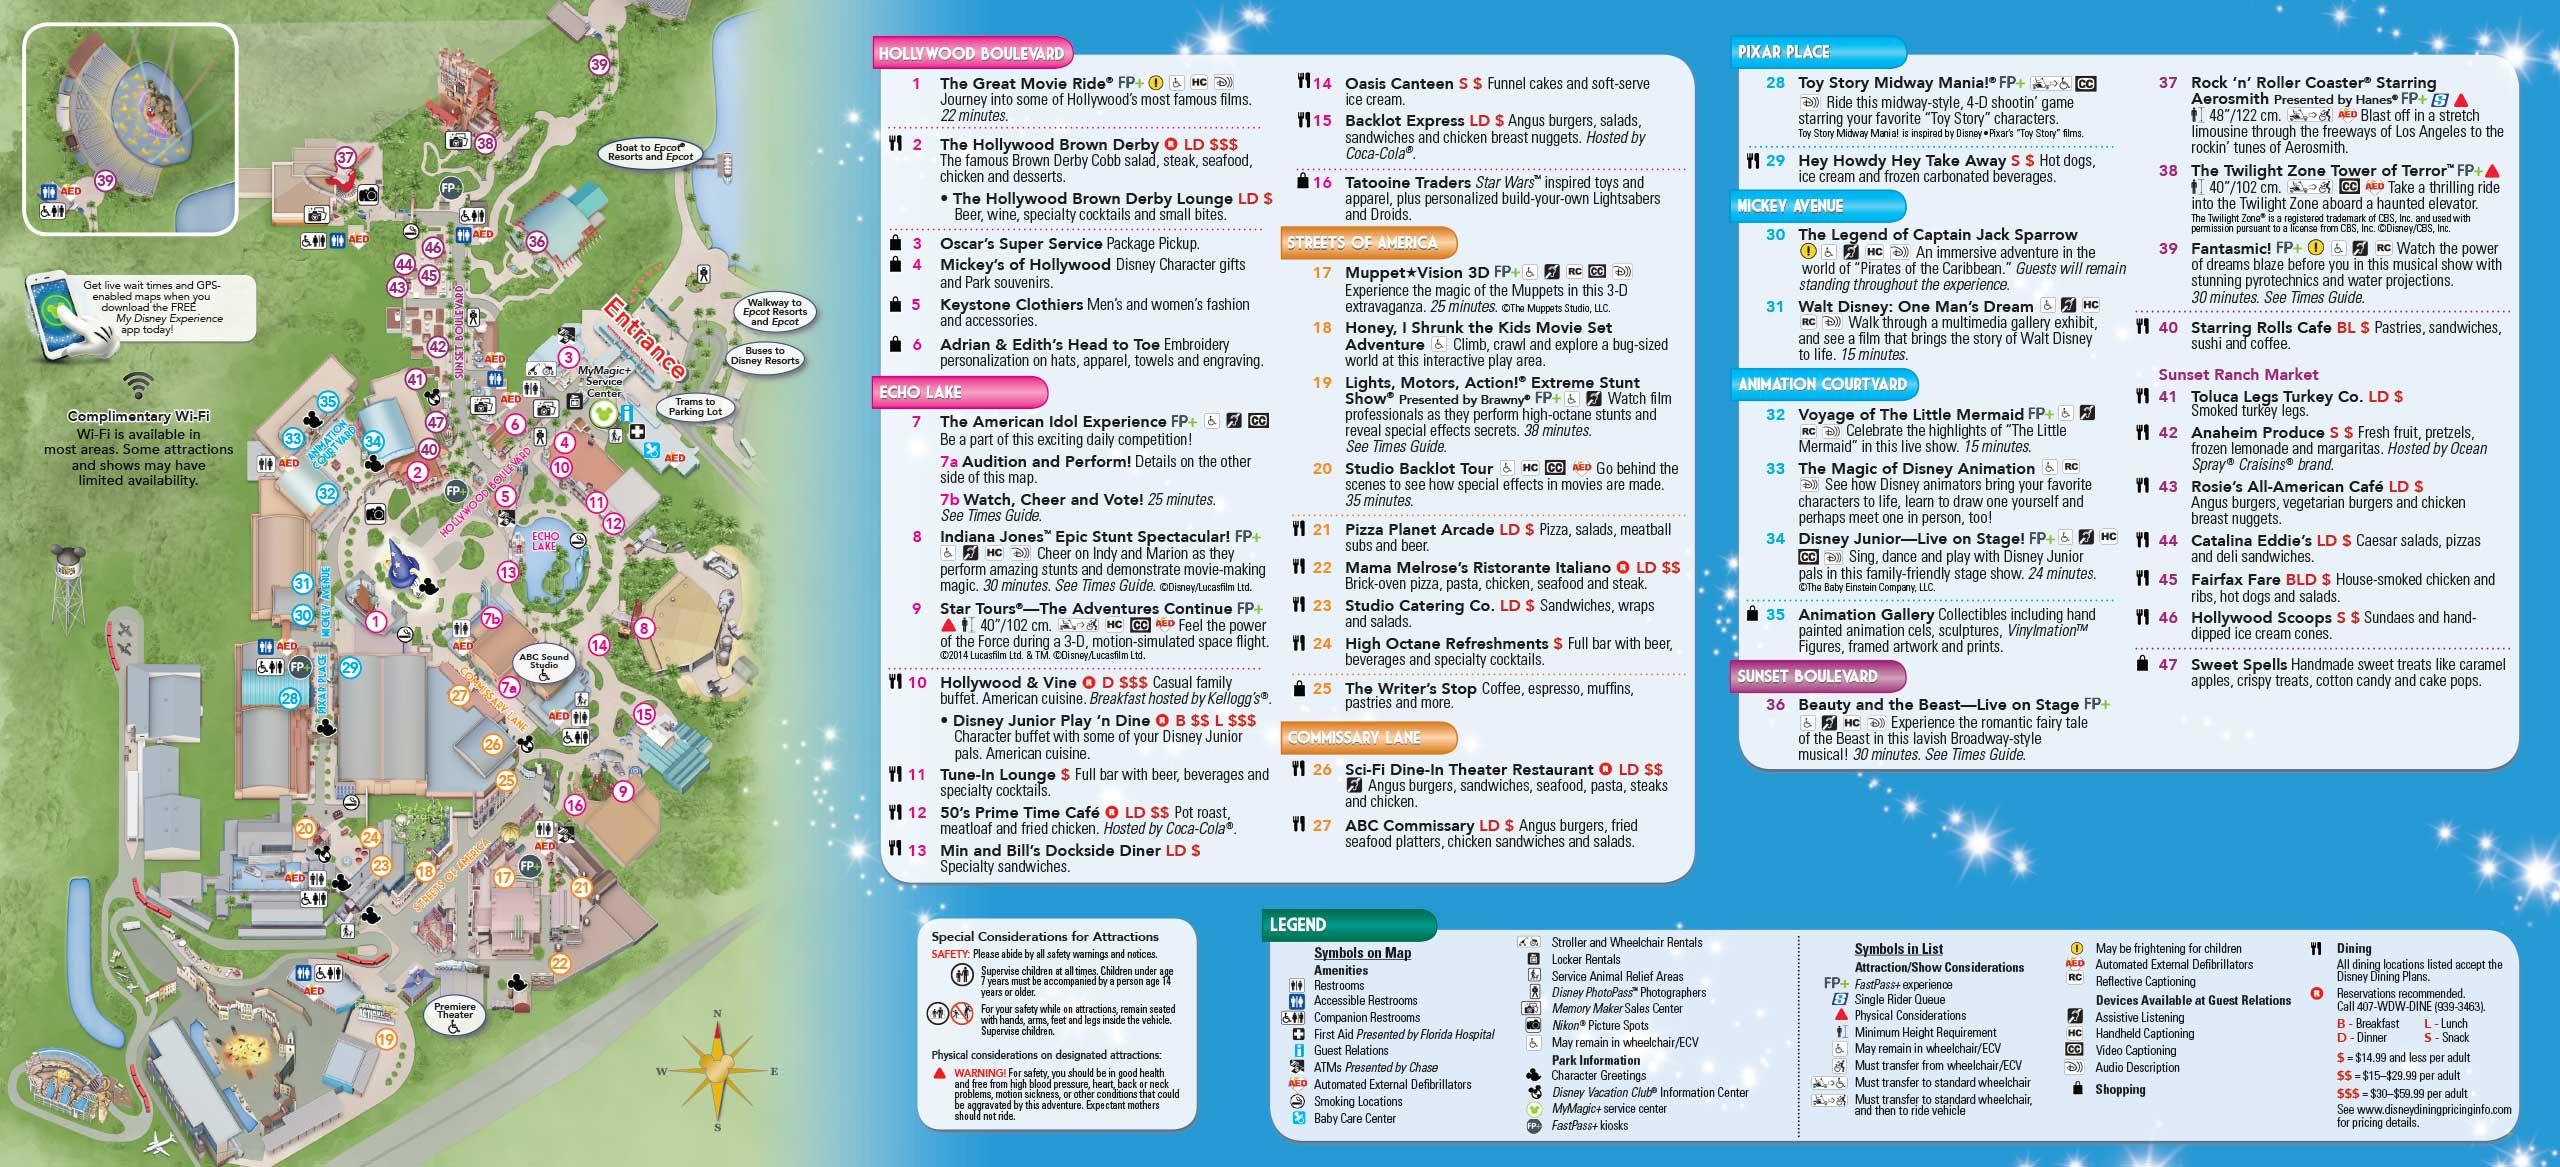 Disney World Map Hollywood Studios.2014 Walt Disney World Park Maps With Fastpass Photo 8 Of 8